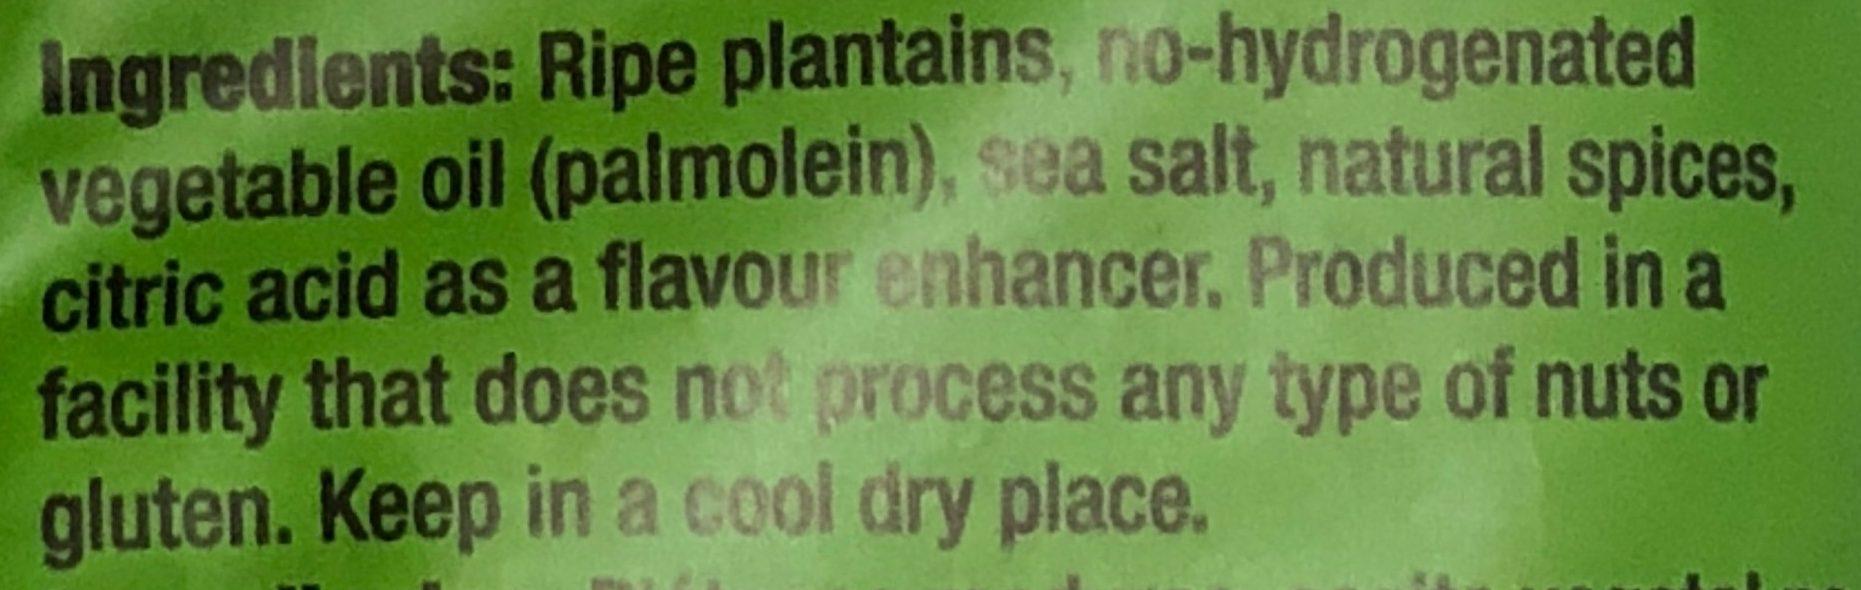 Plantain Chips Smoked Chili - Ingredients